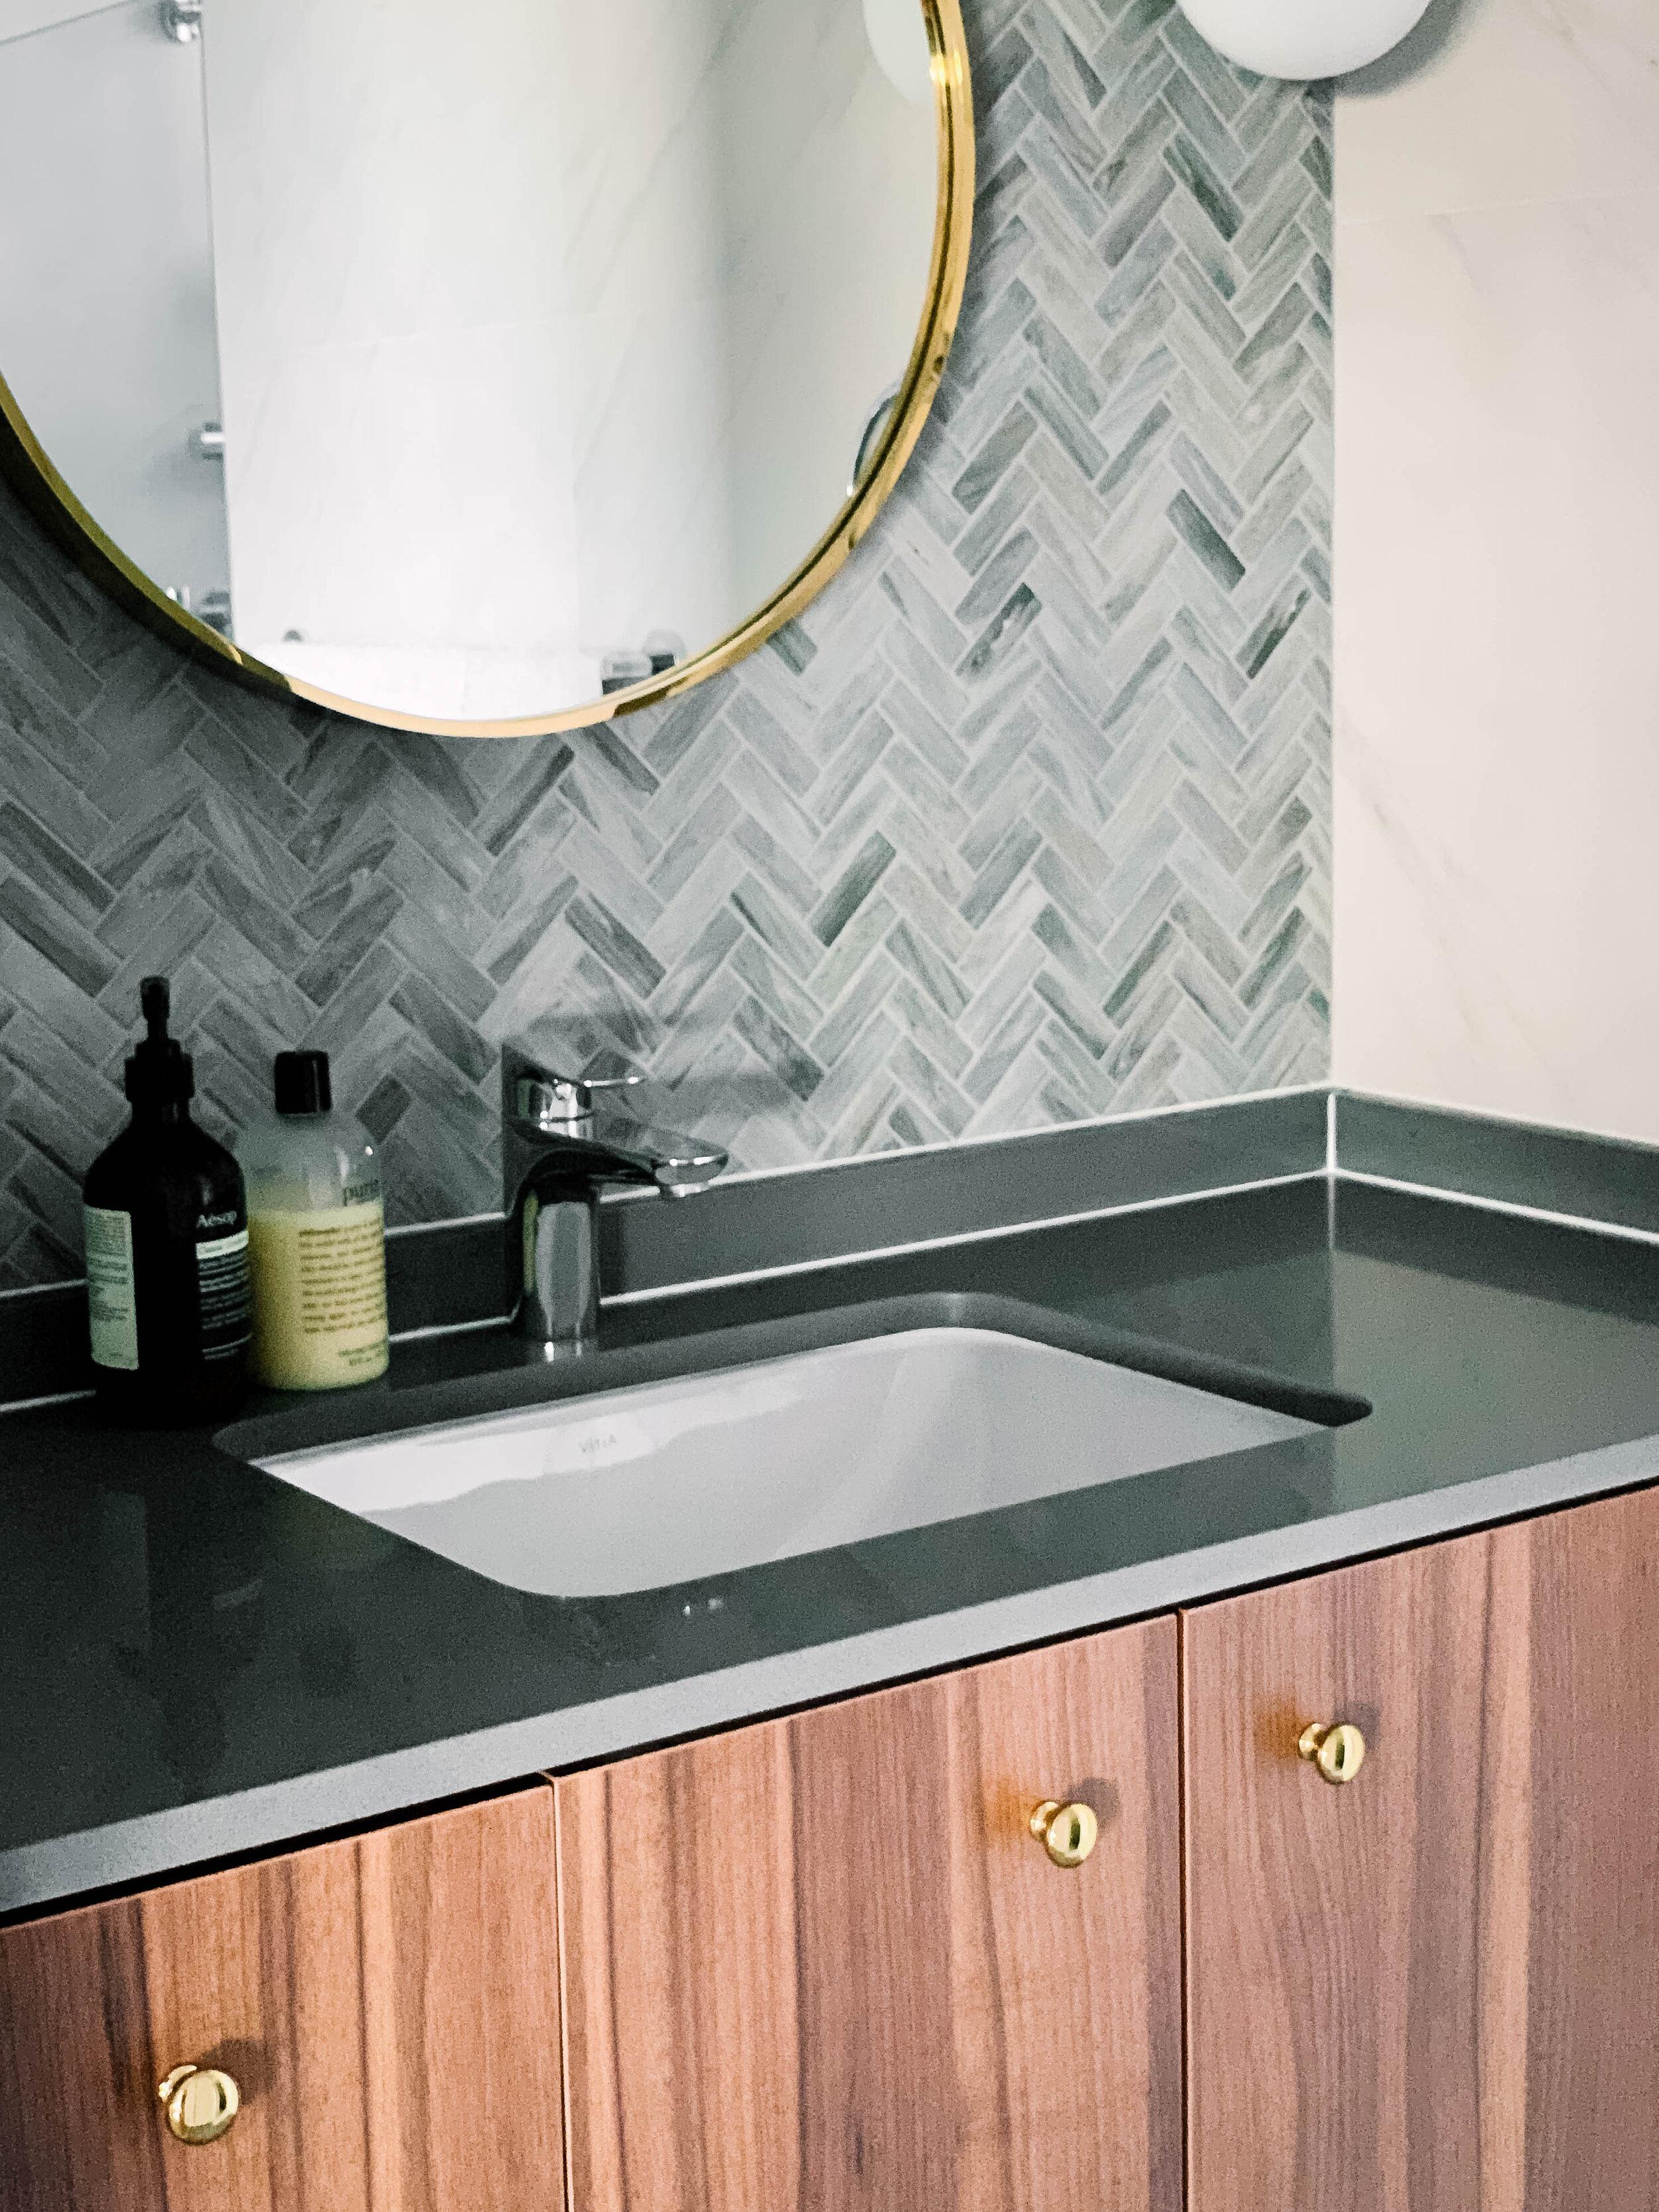 Chic Grey and Gold Bathroom Design (6 of 7).jpg